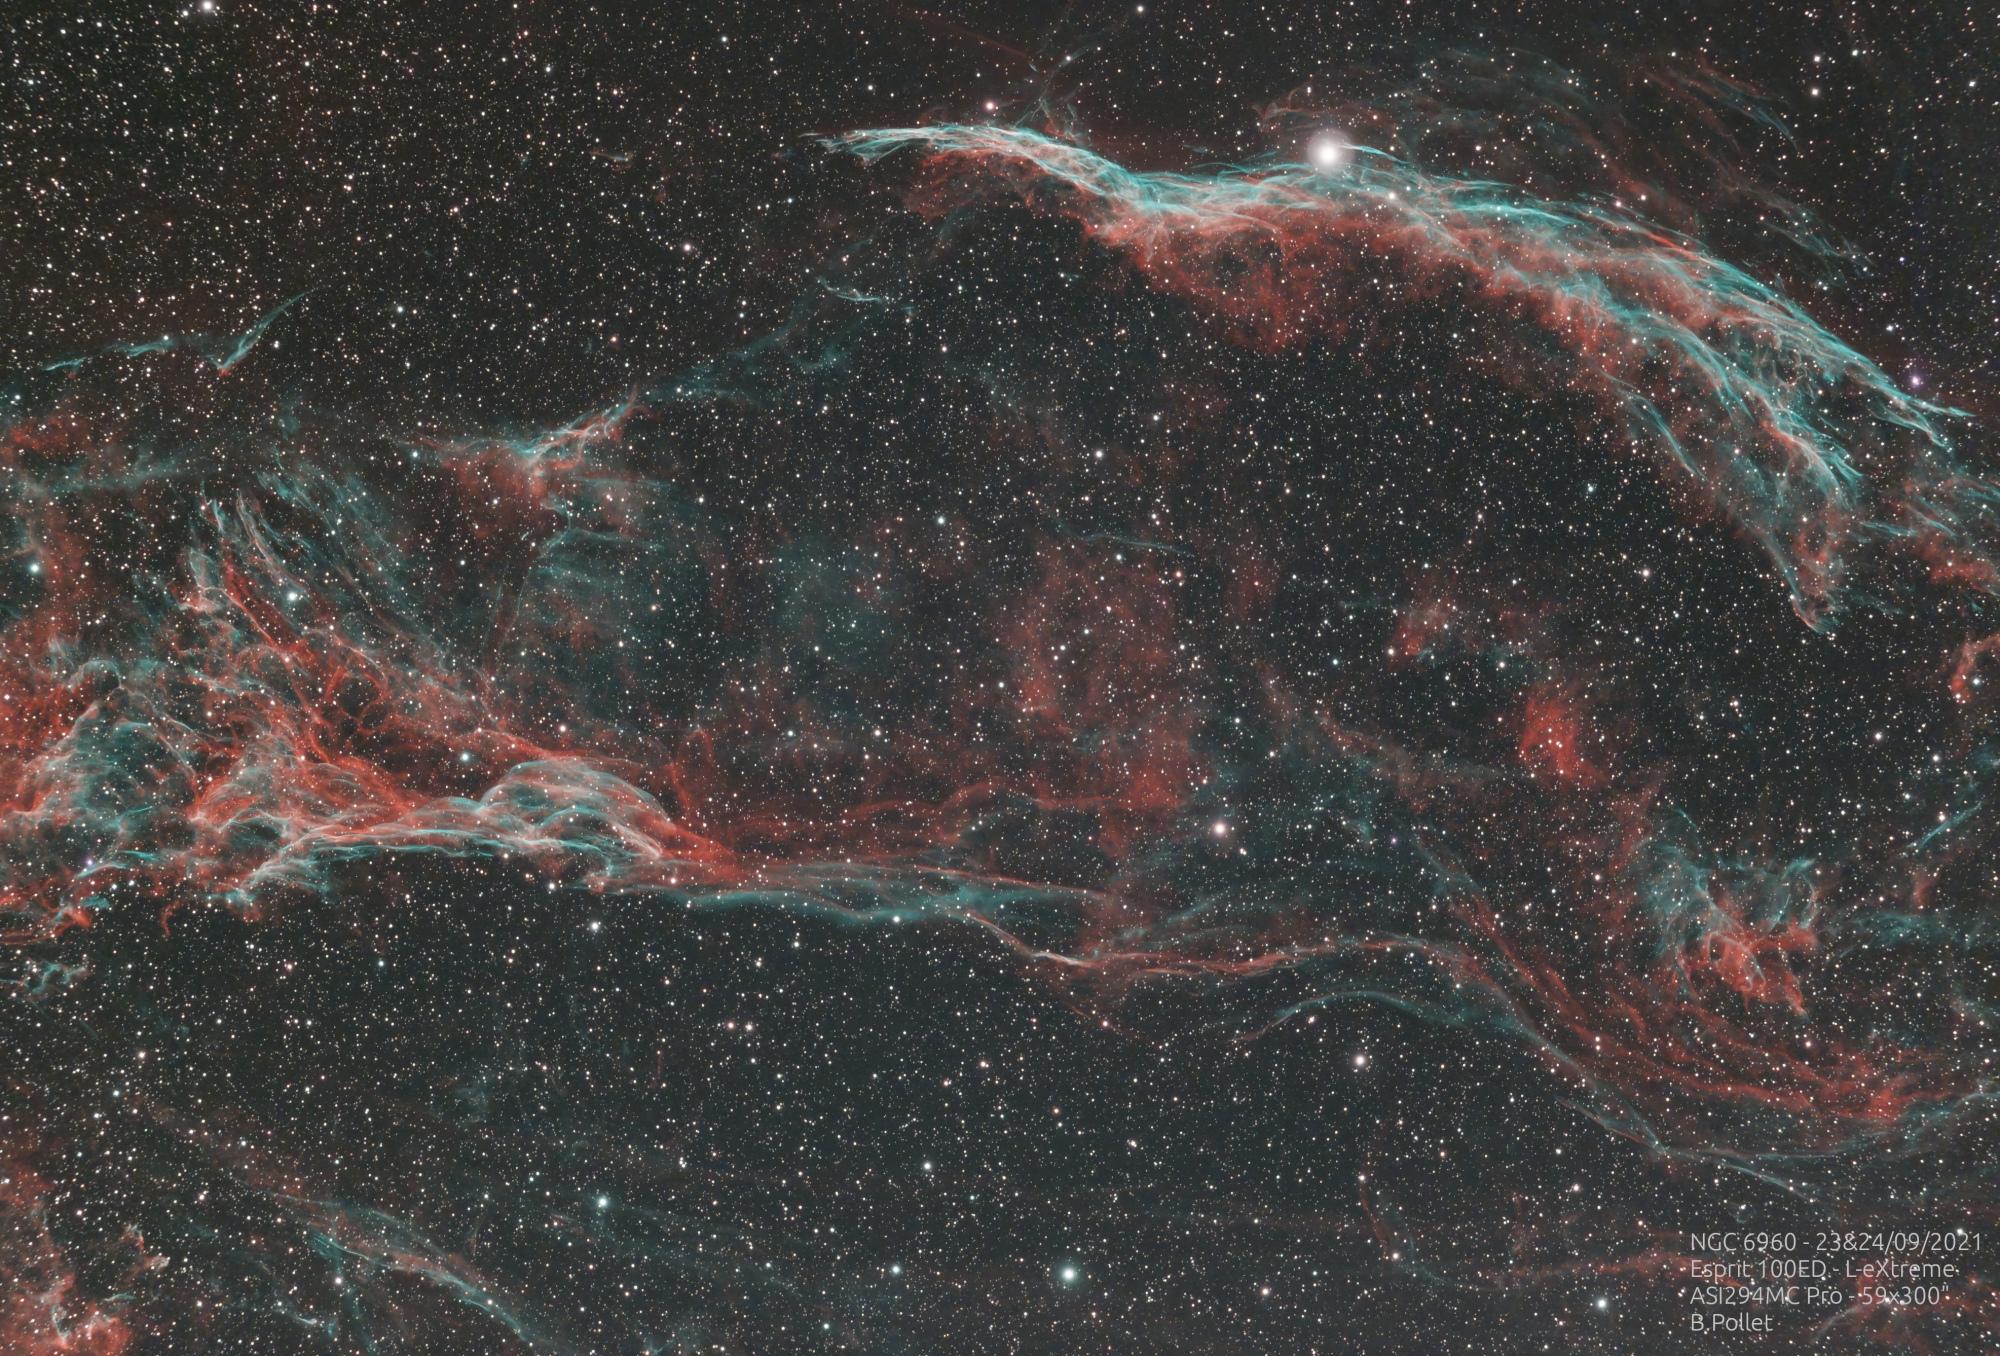 2021-09-23&24_NGC6960-texte.jpg